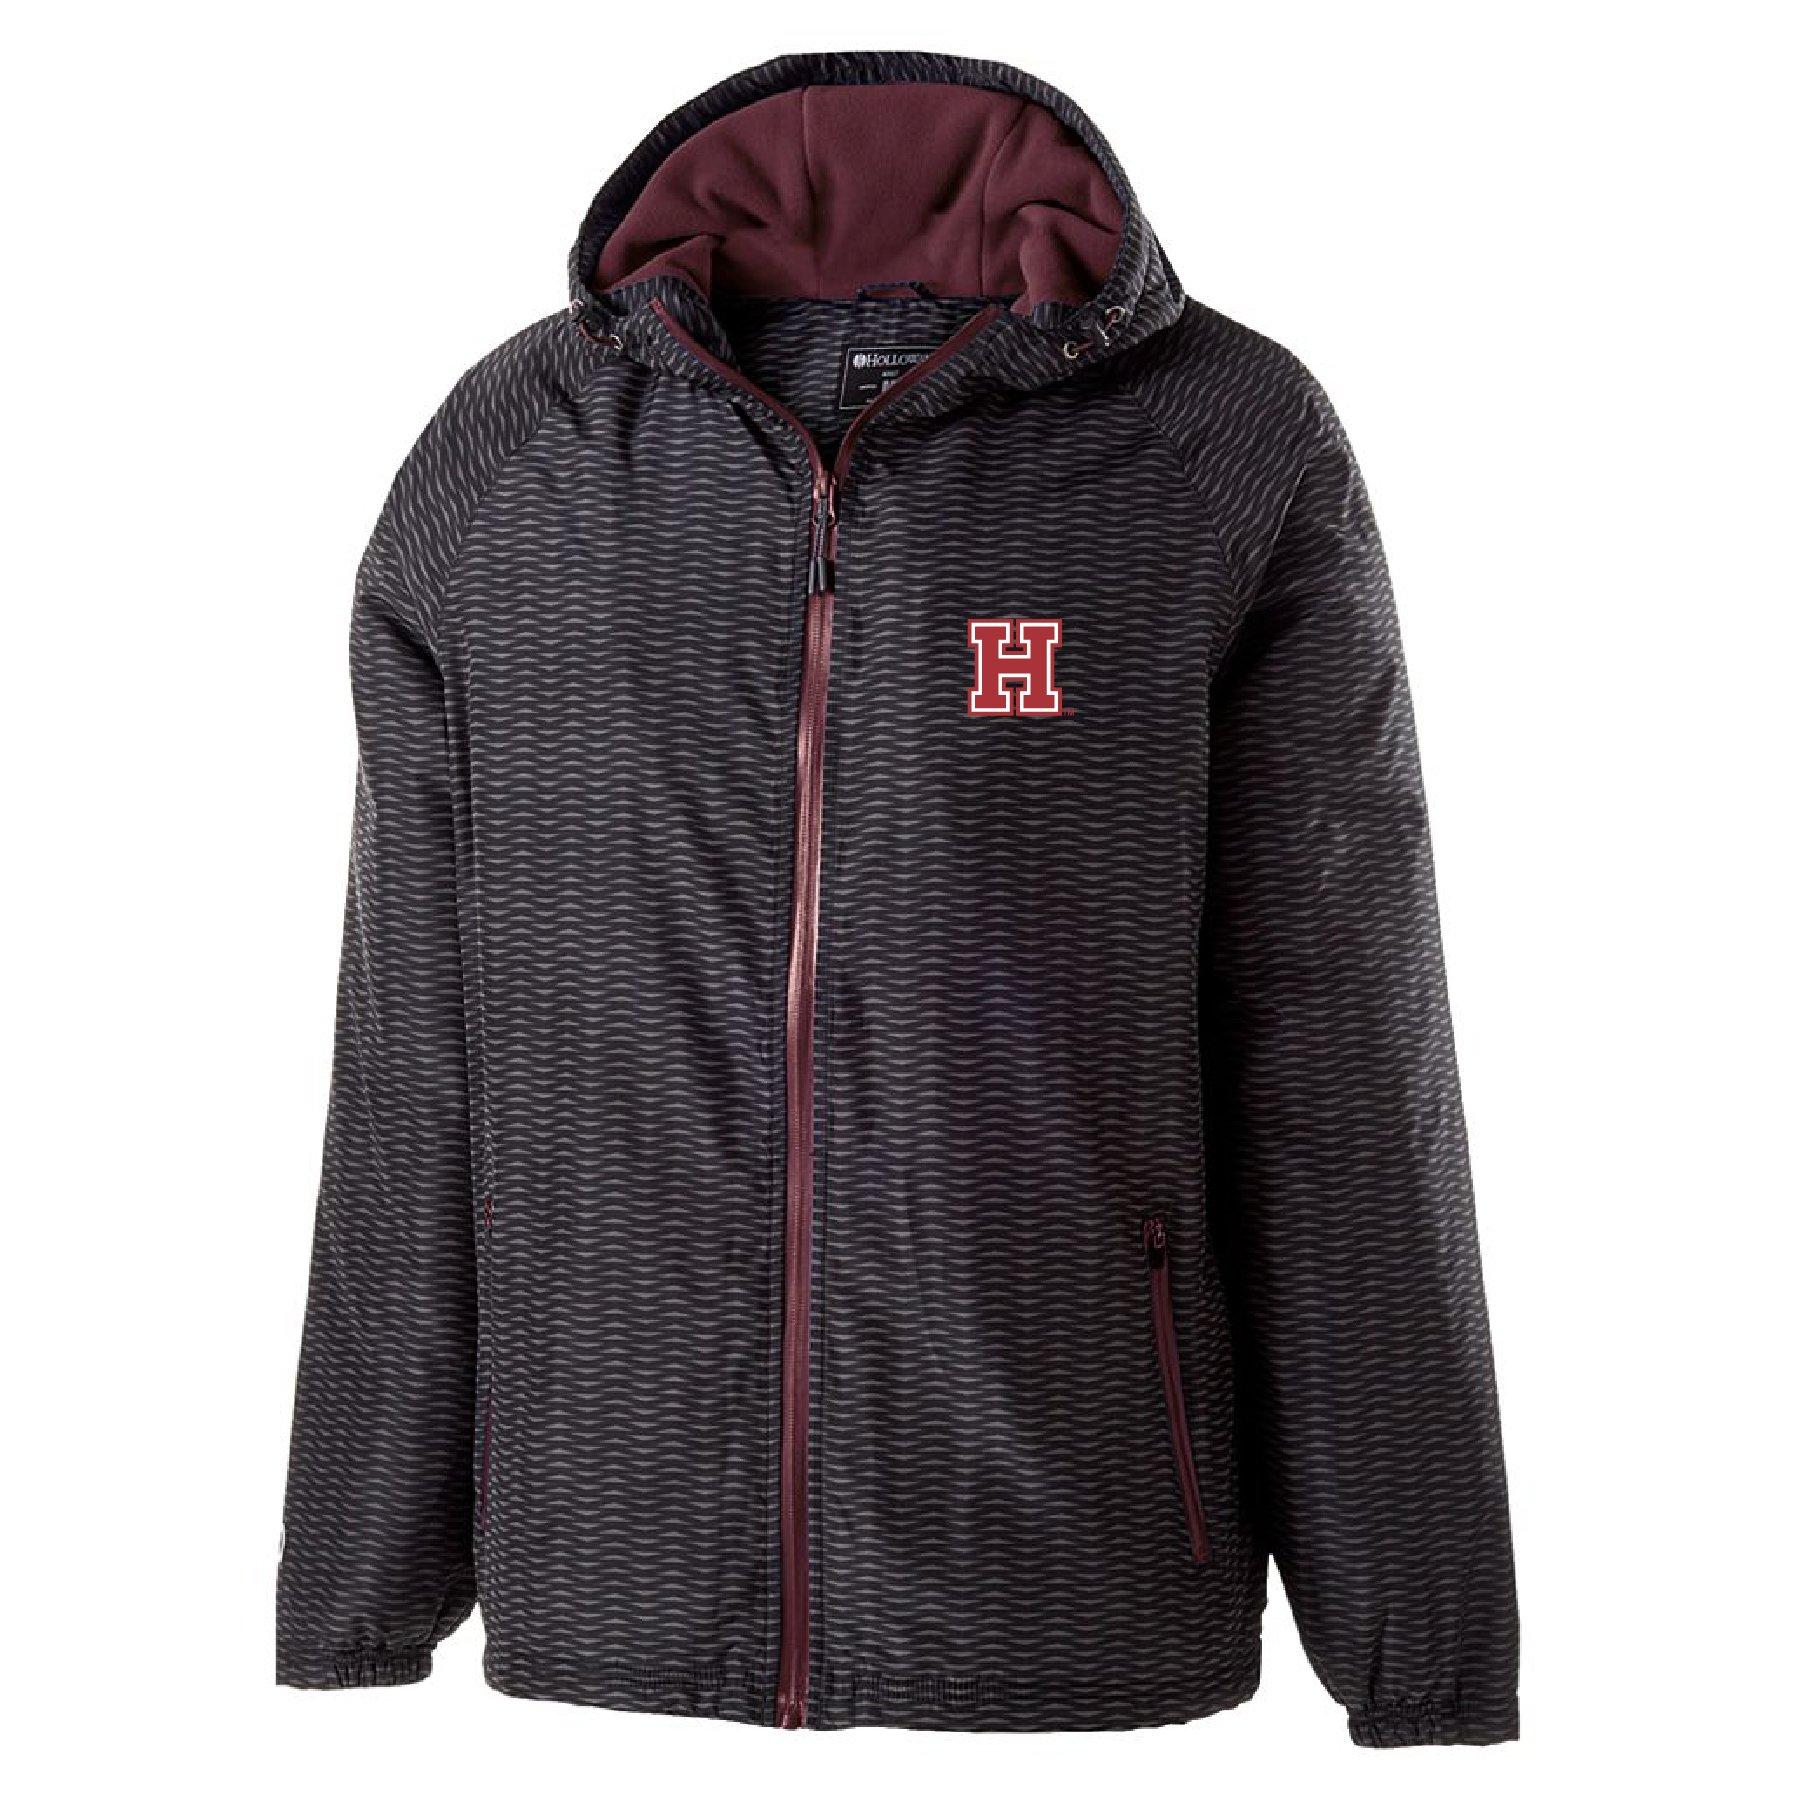 Ouray Sportswear NCAA Harvard Crimson Range Jacket, Large, Maroon